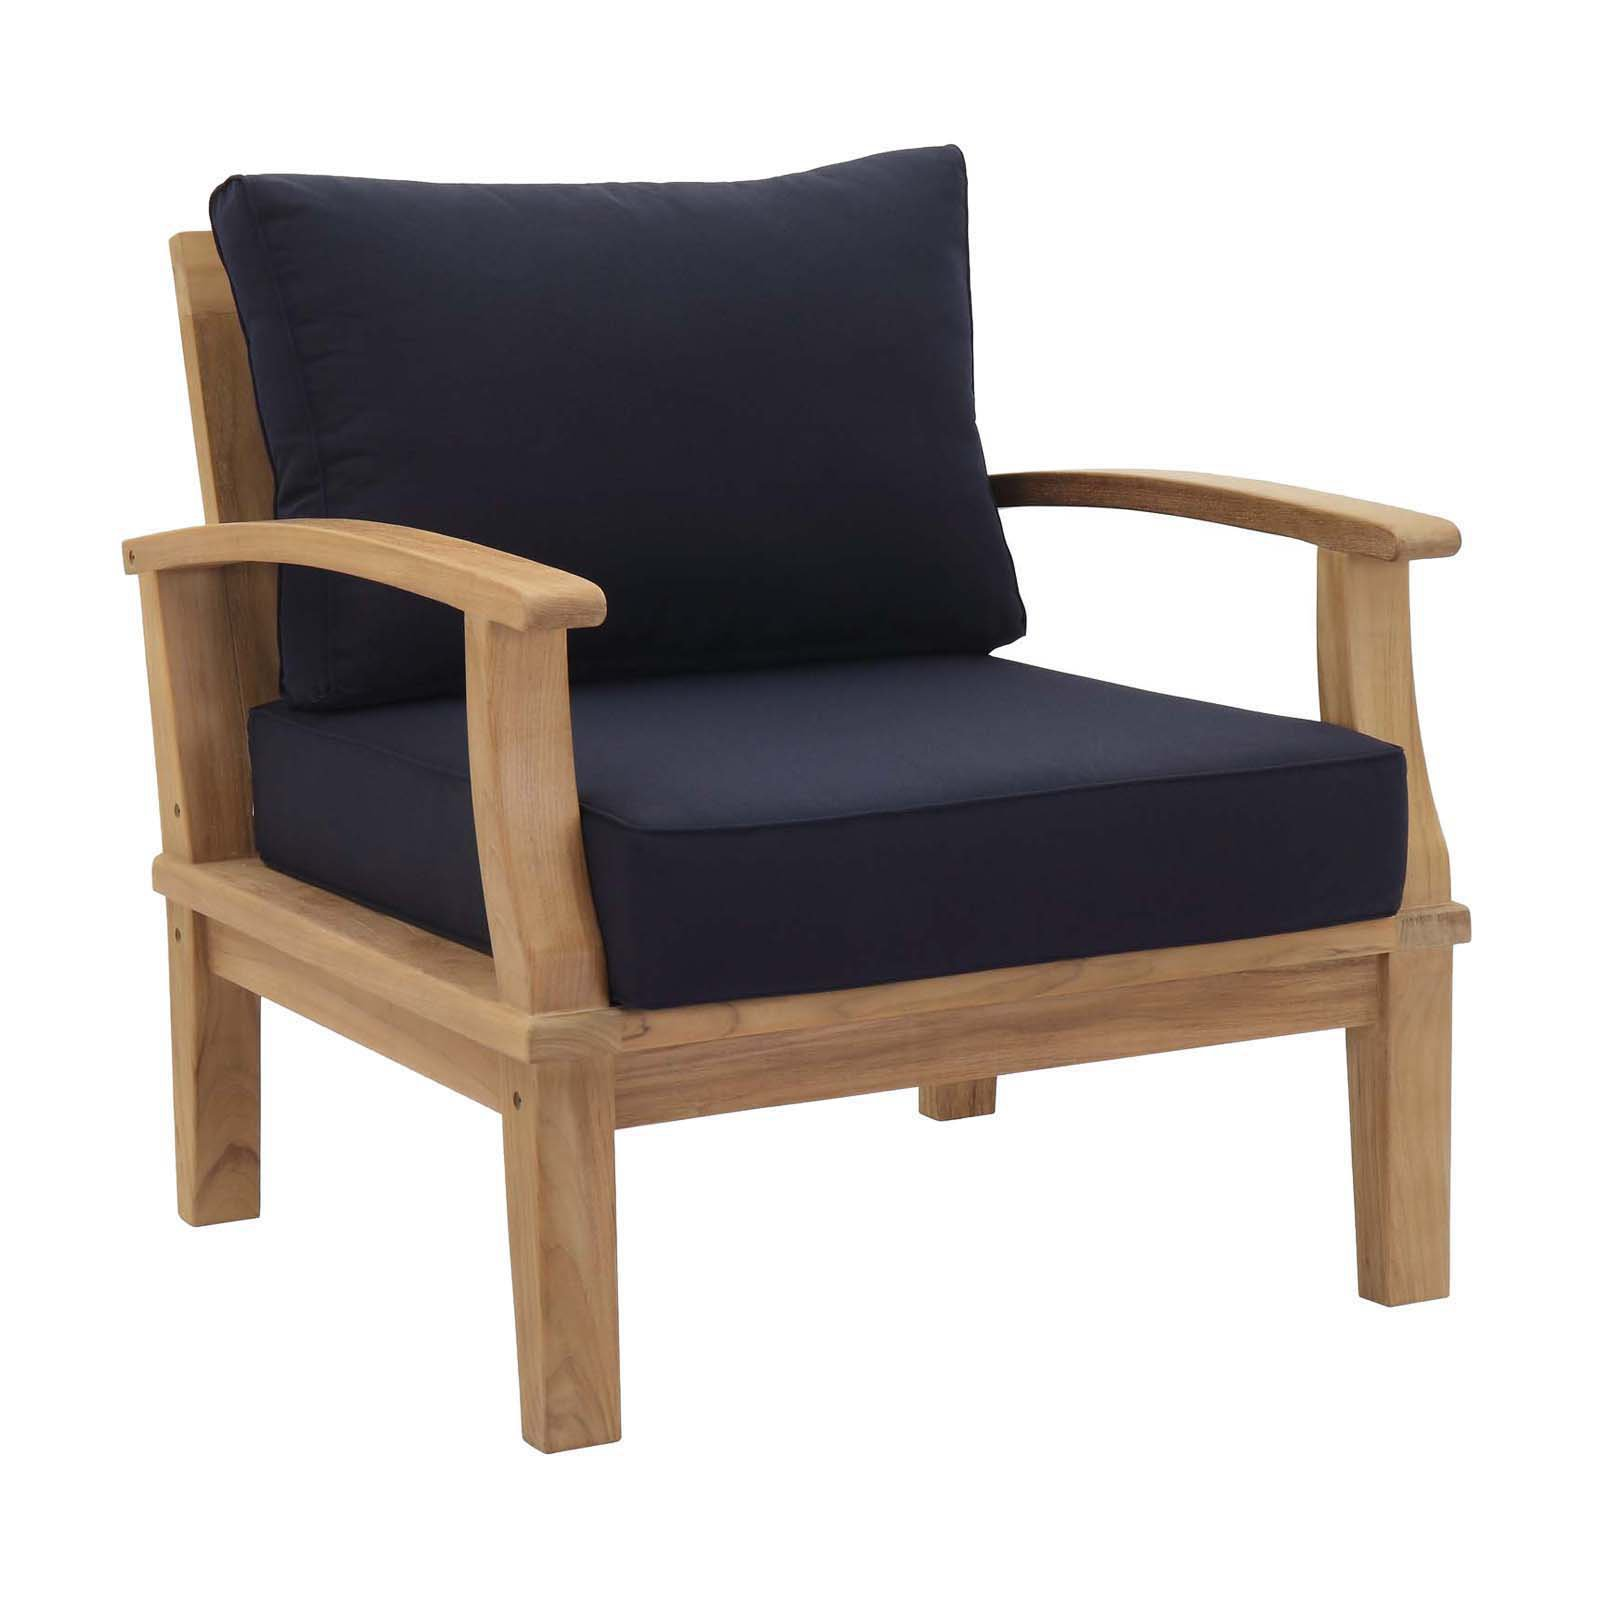 modway patio furniture walmart com